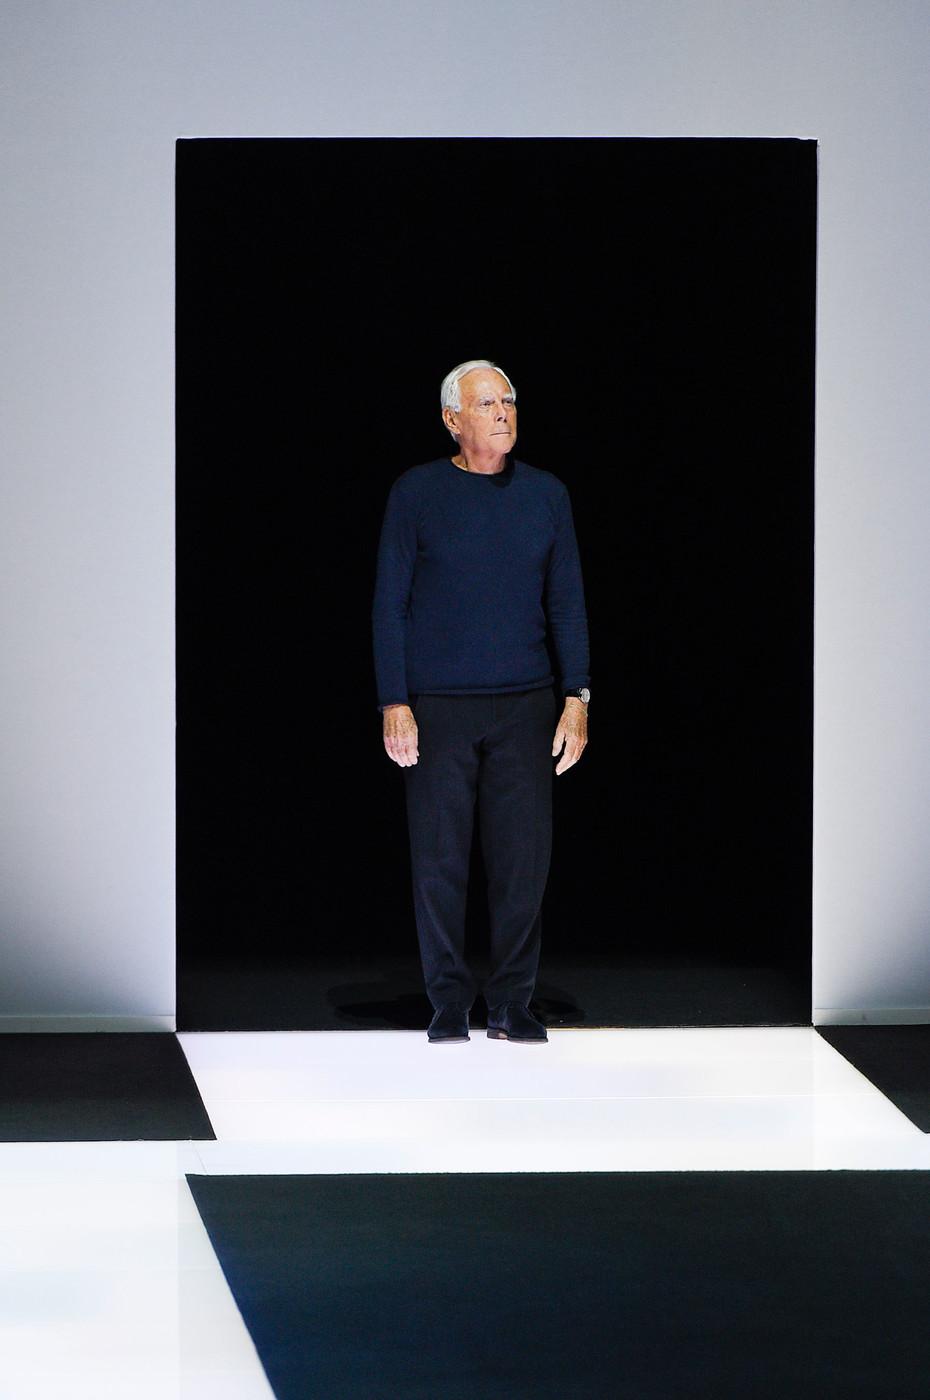 Giorgio Armani visits Moscow / fashion news via www.fashionedbylove.co.uk